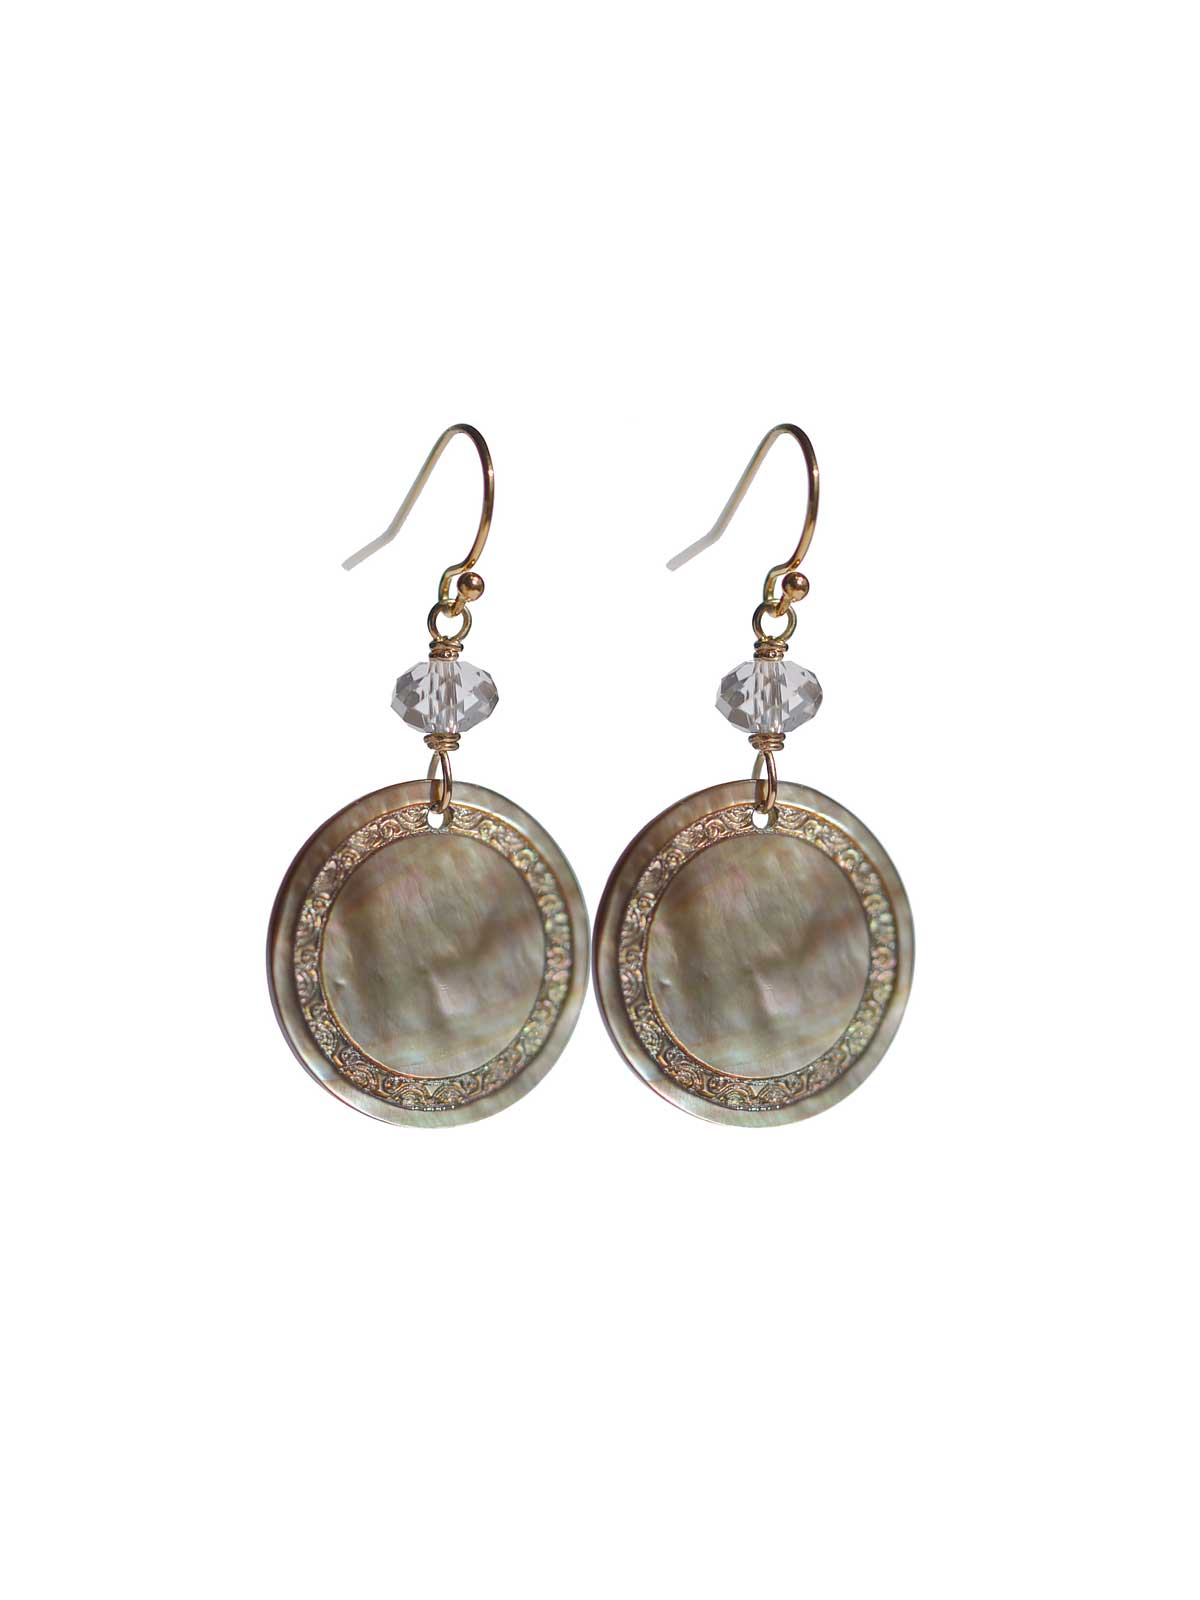 Earrings 14K Gold-filled Mother-of-pearl Swarovski Crystal